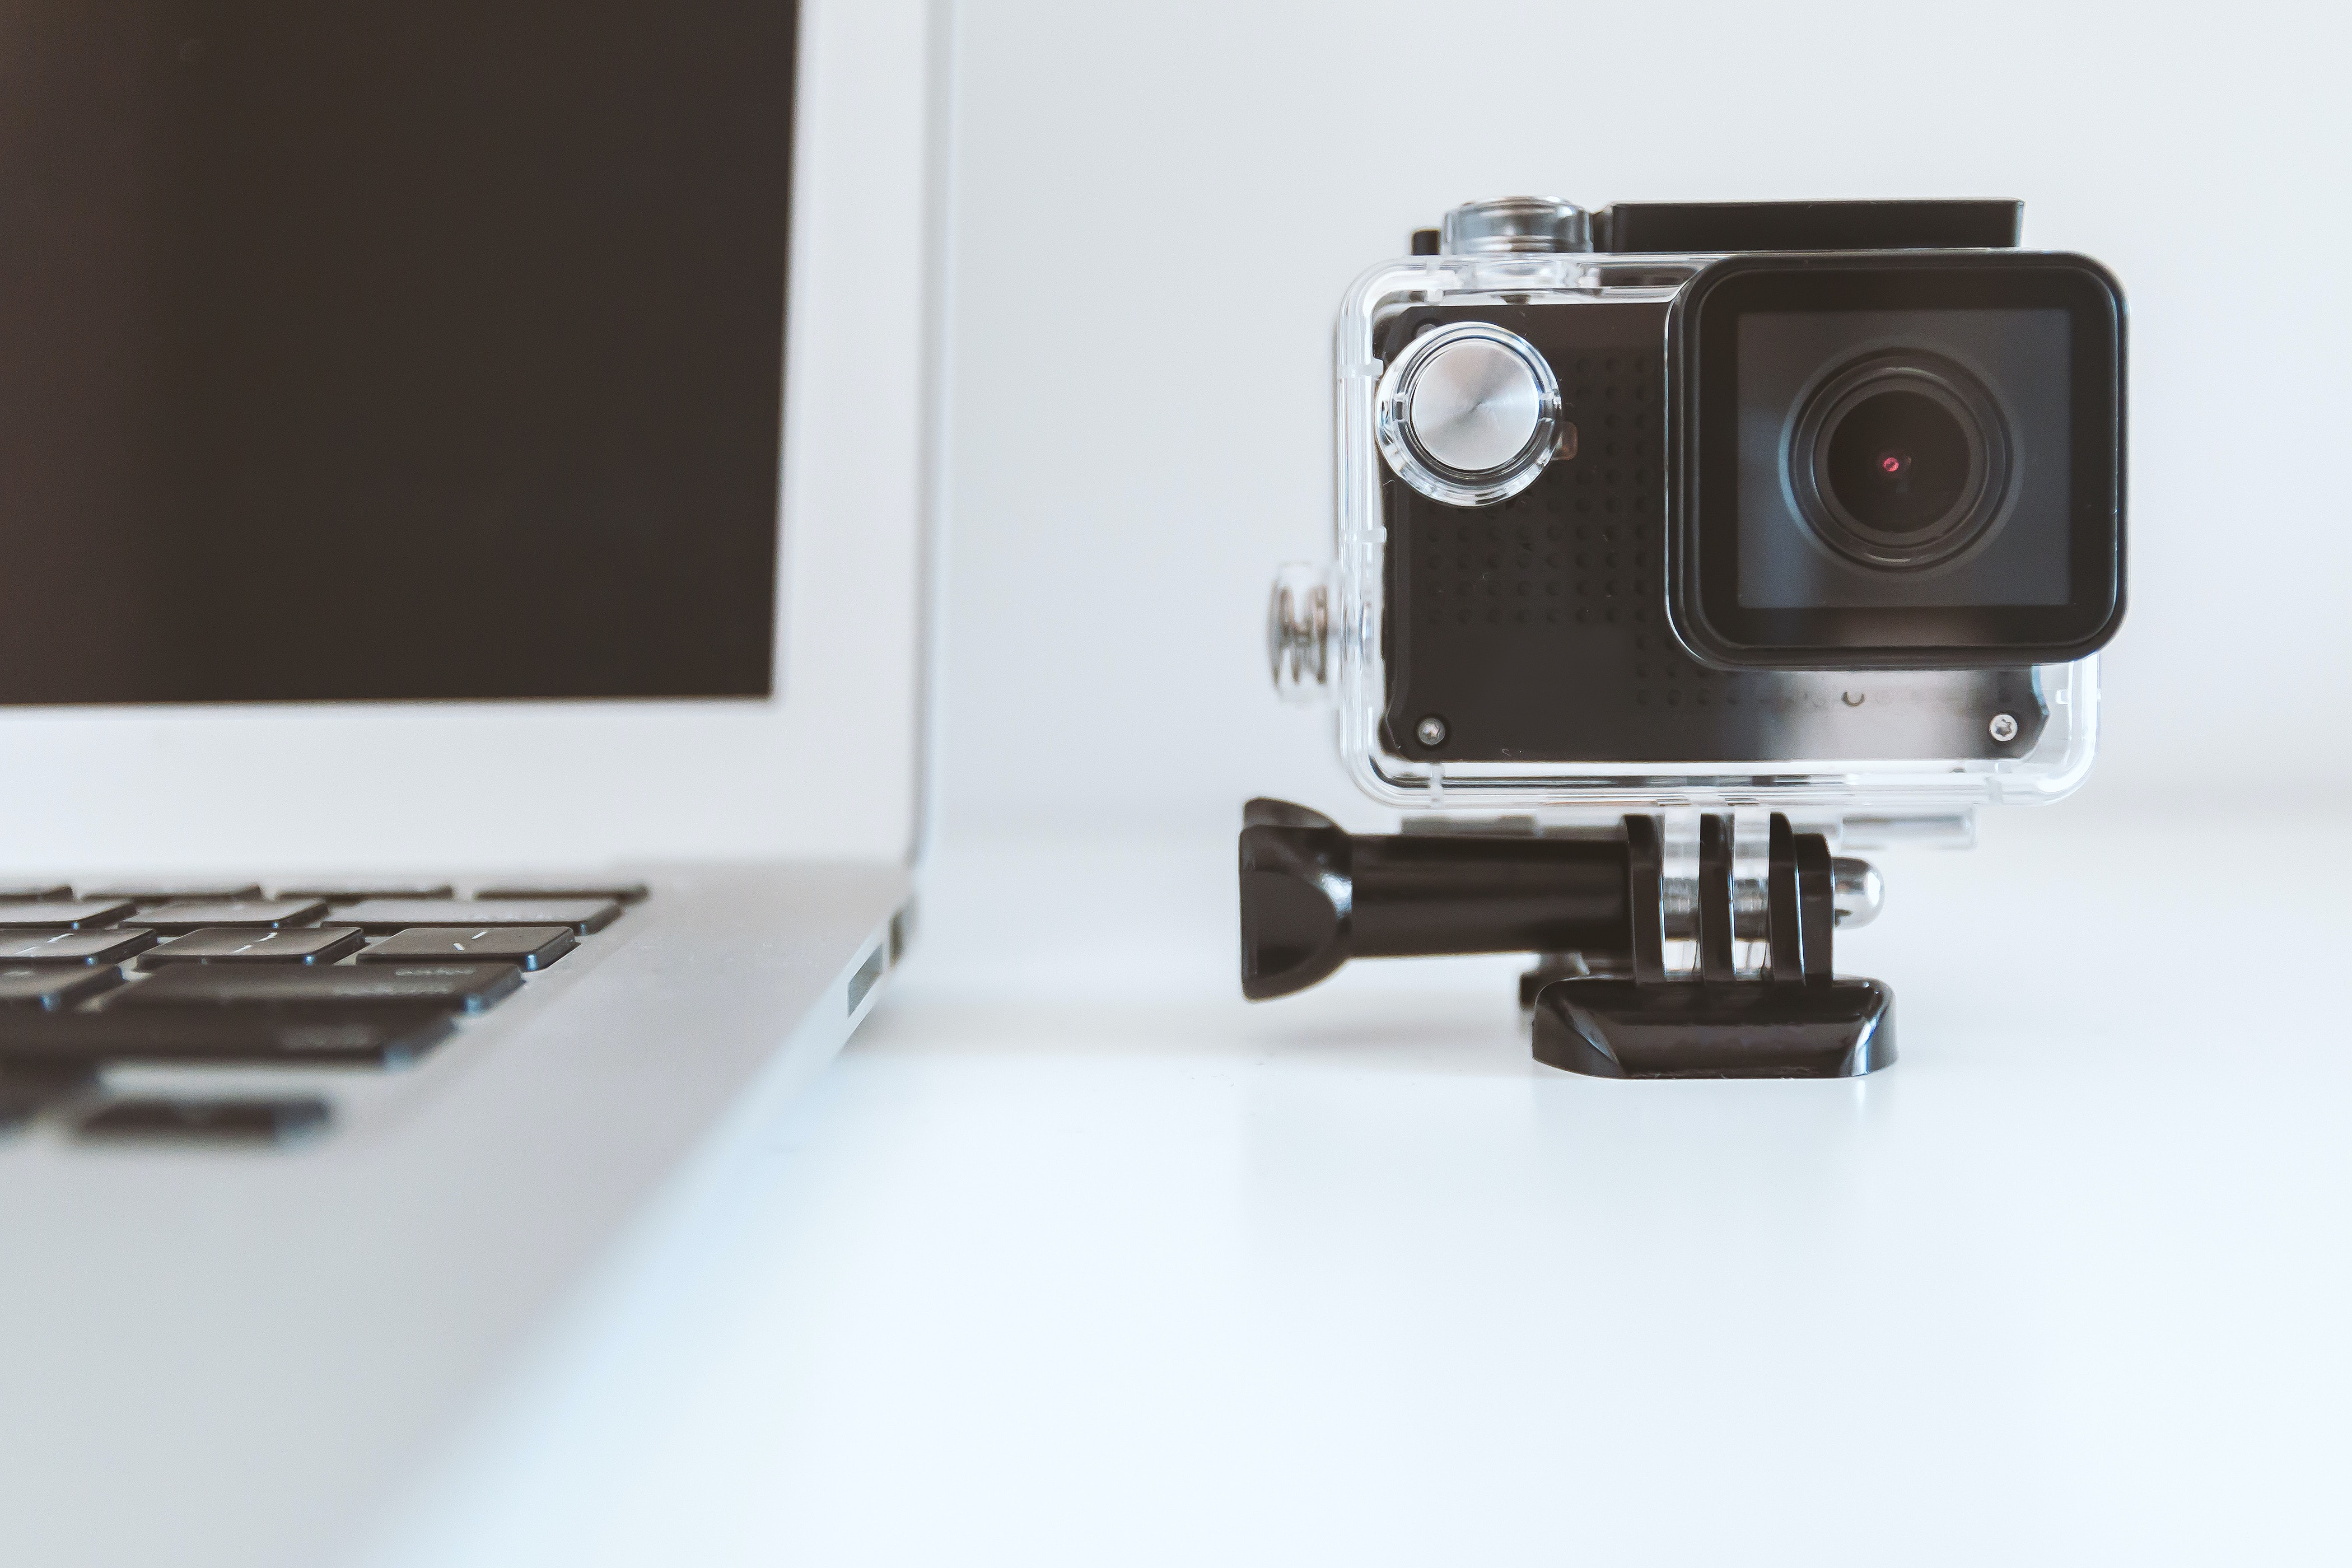 black action camera beside white laptop